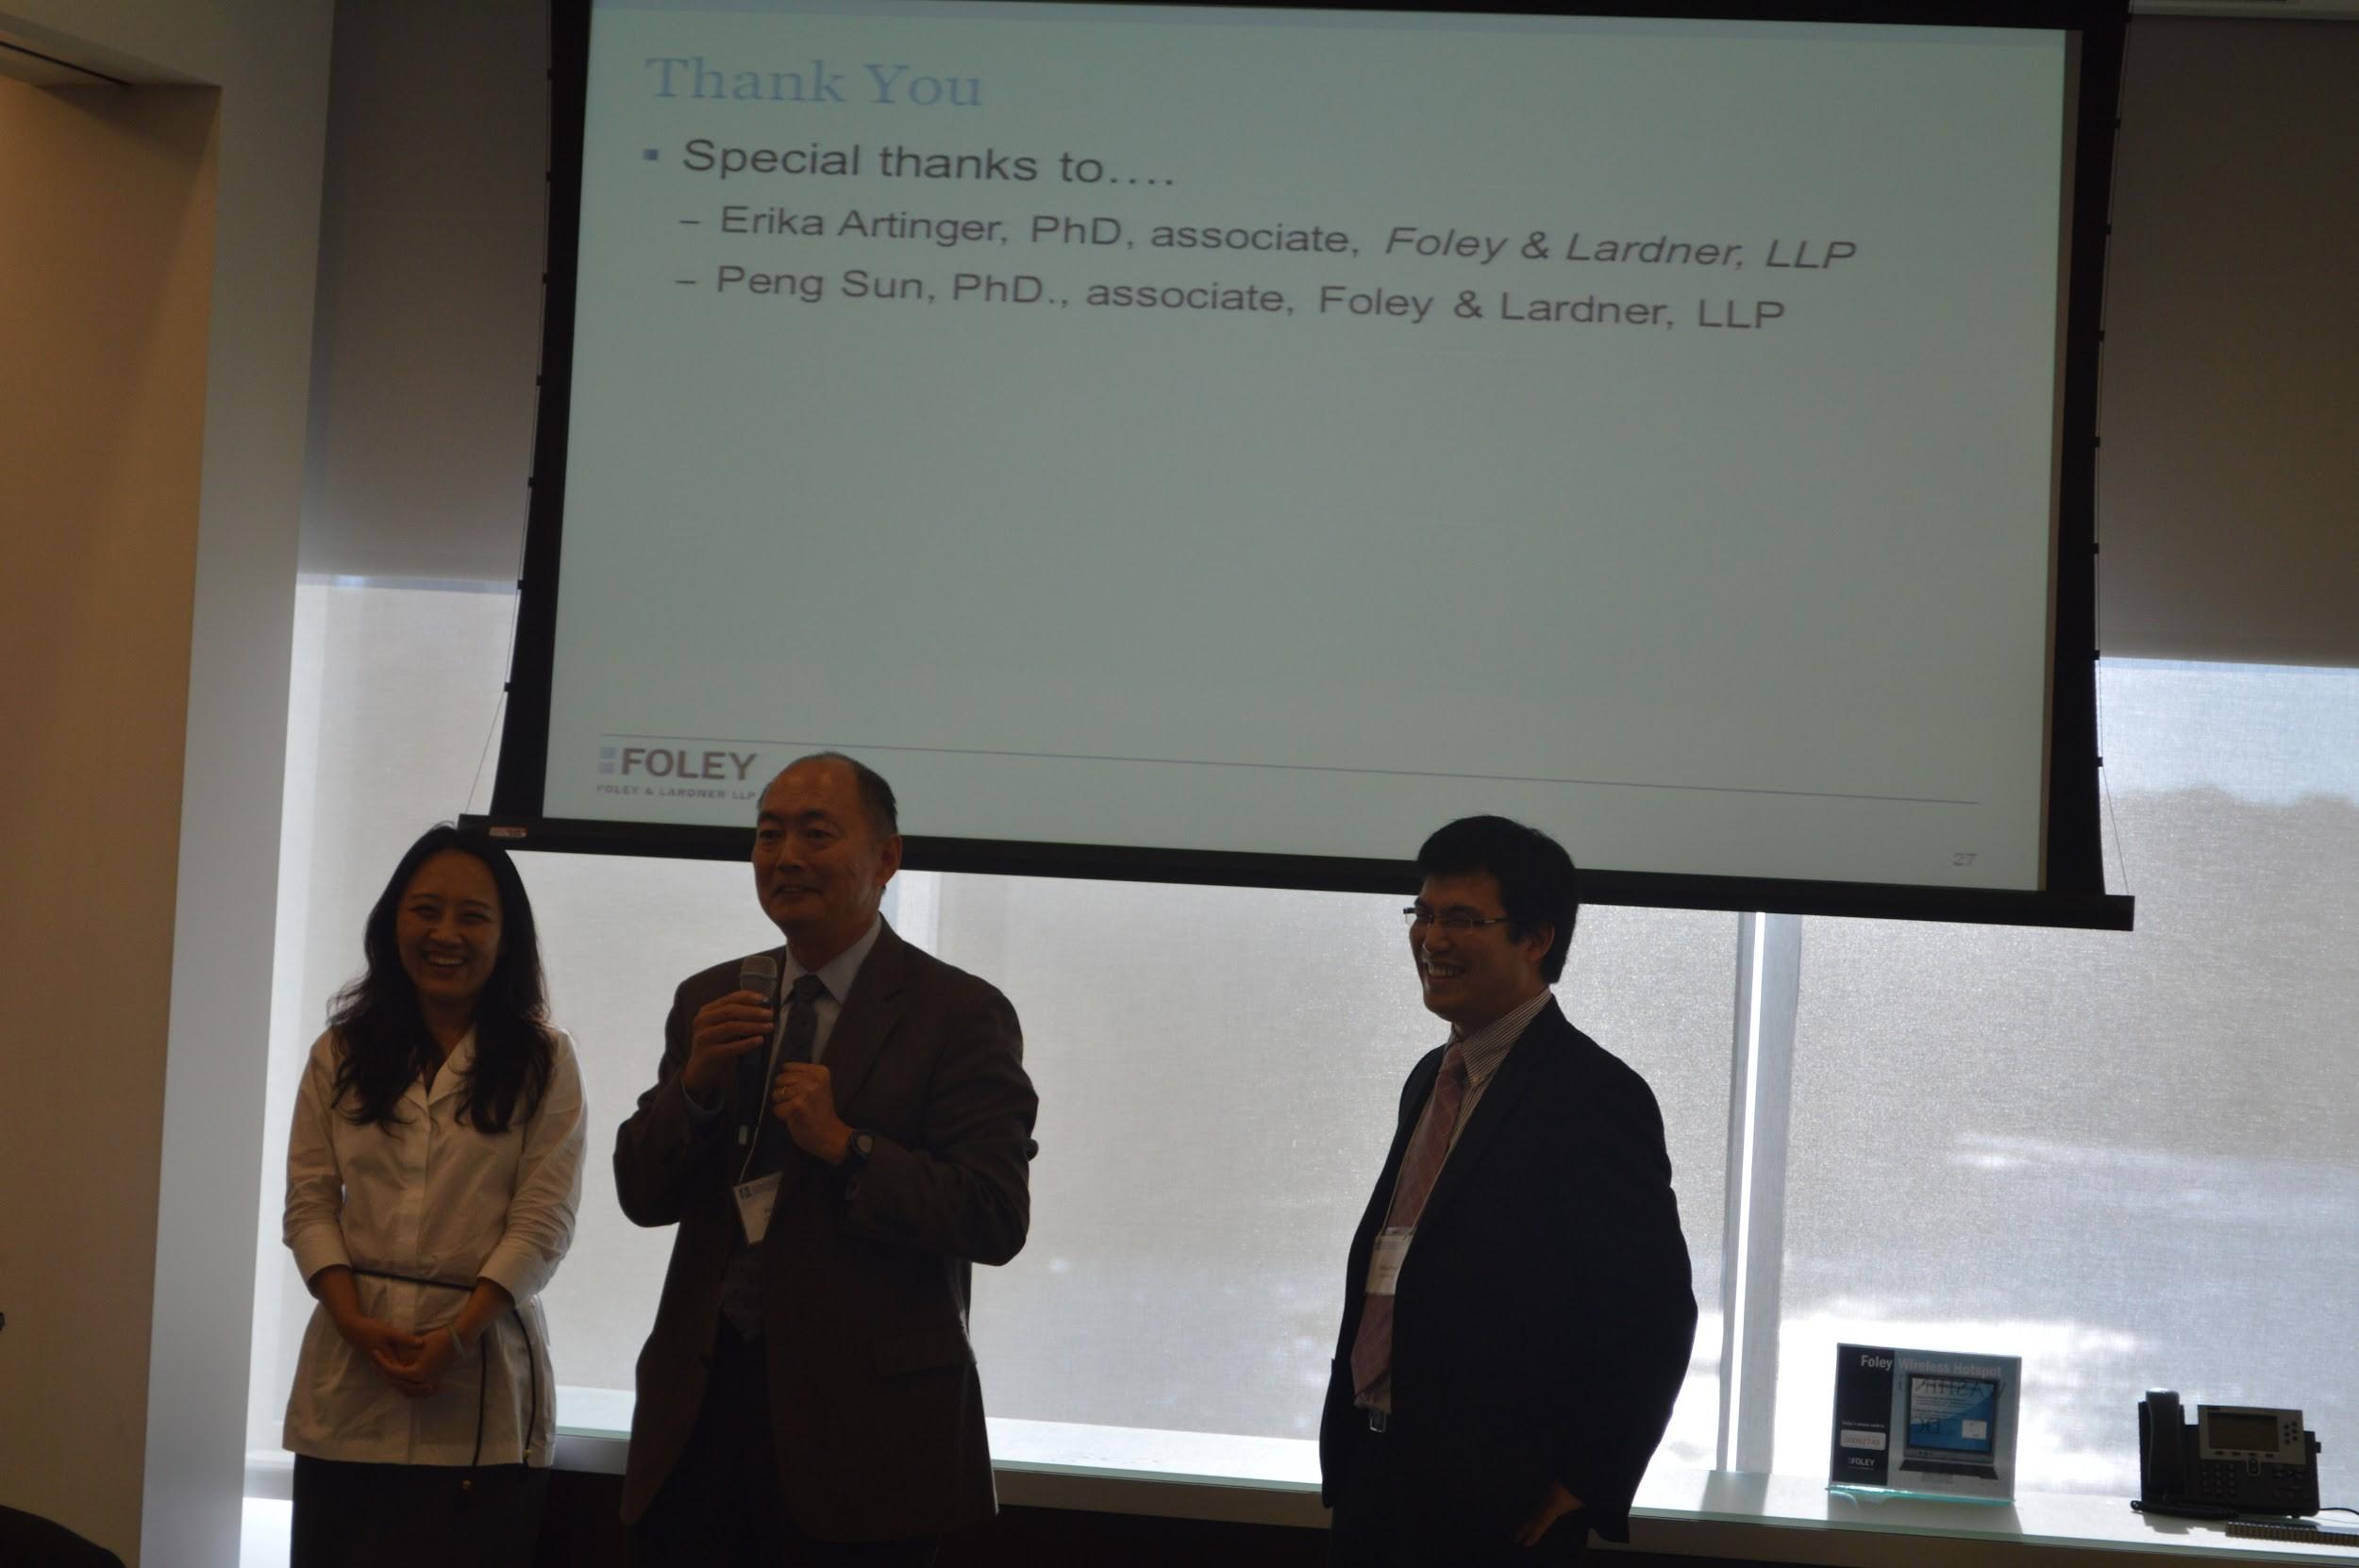 SAPA-DC首任会长Amanda Fu,现任会长Fred Yang和候任会长Vince Deng (摄影:Tiange Cui)